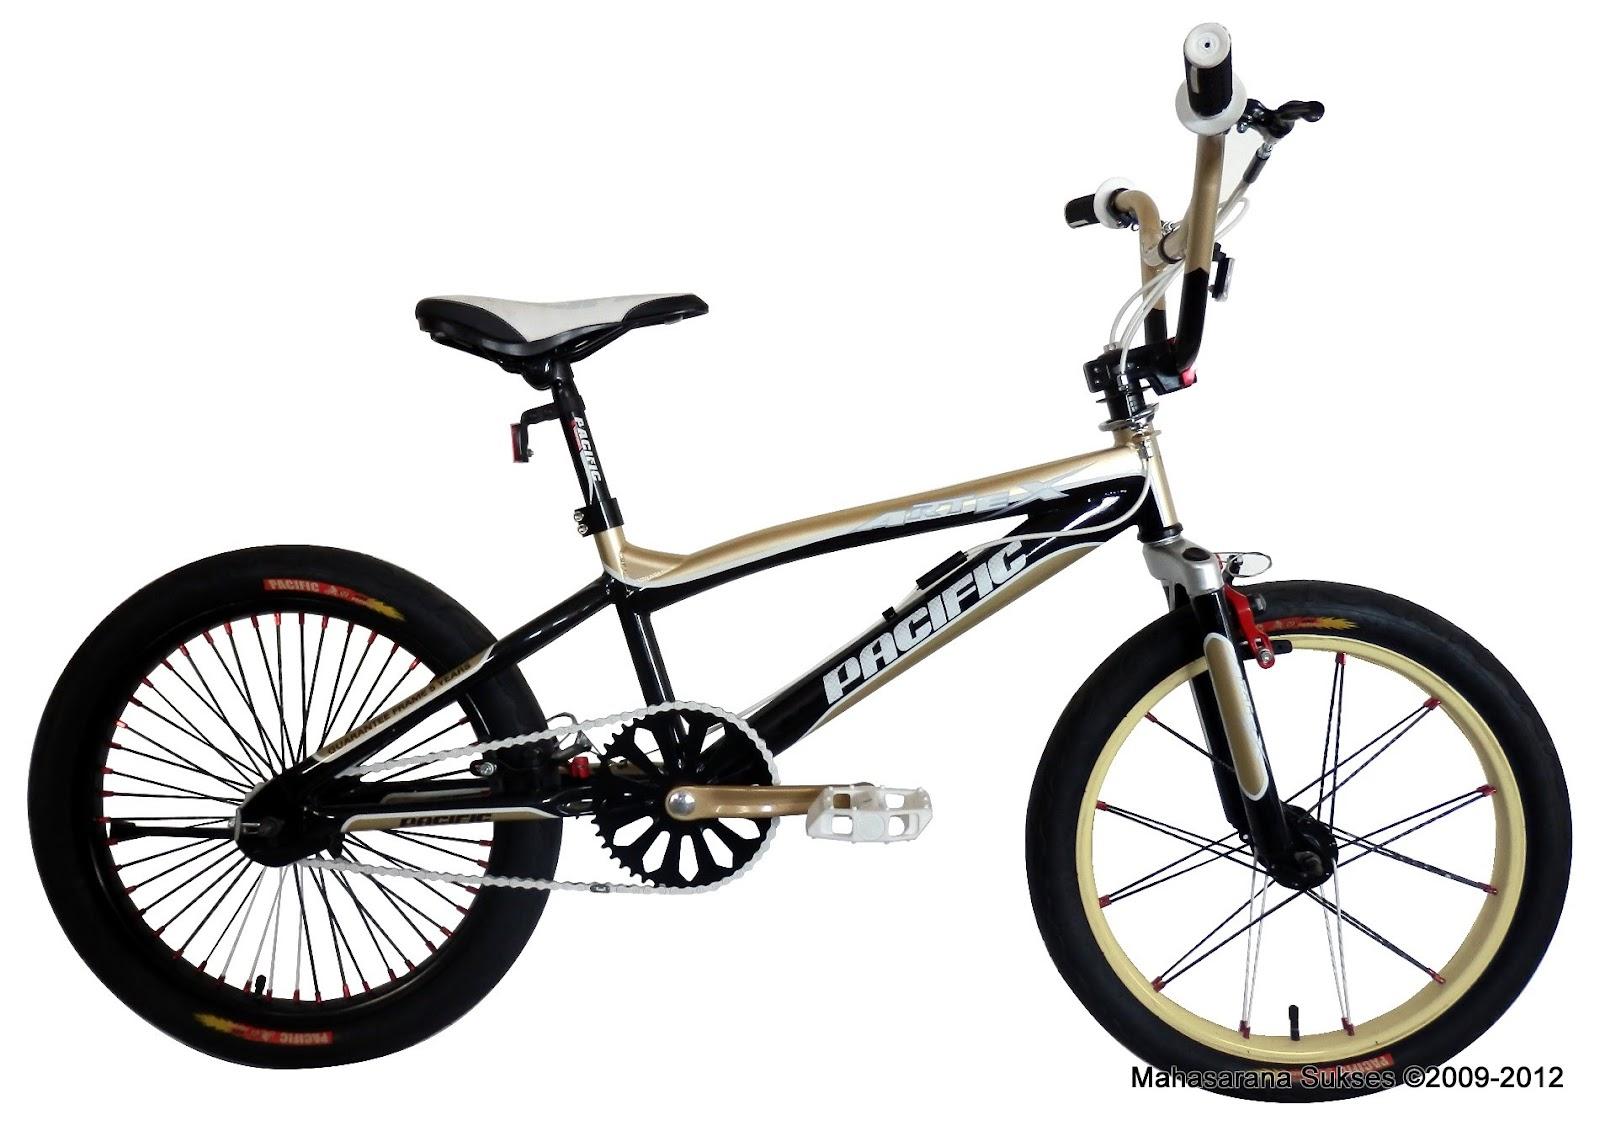 Daftar Harga Sepeda BMX TerMurah Desember 2013 - Info